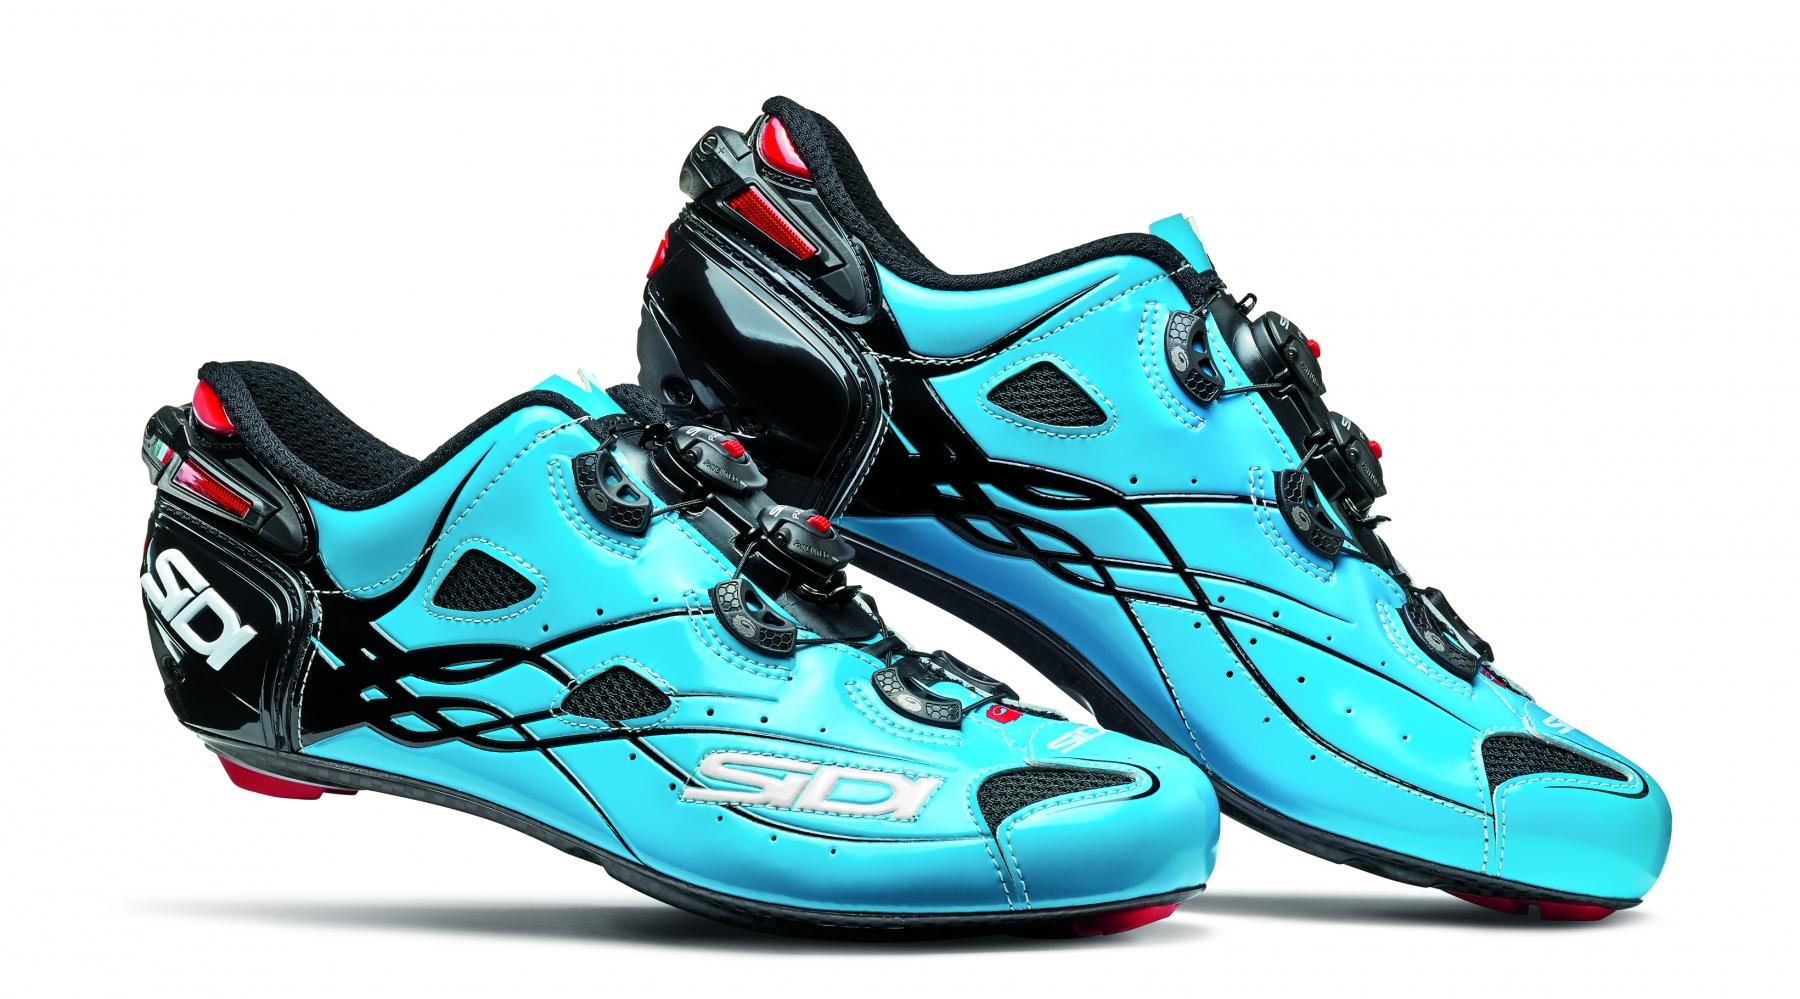 Sidi Carbon Rennradschuhe Blue Cycling Parts Shot Lucido Skyblack zqMVpSU